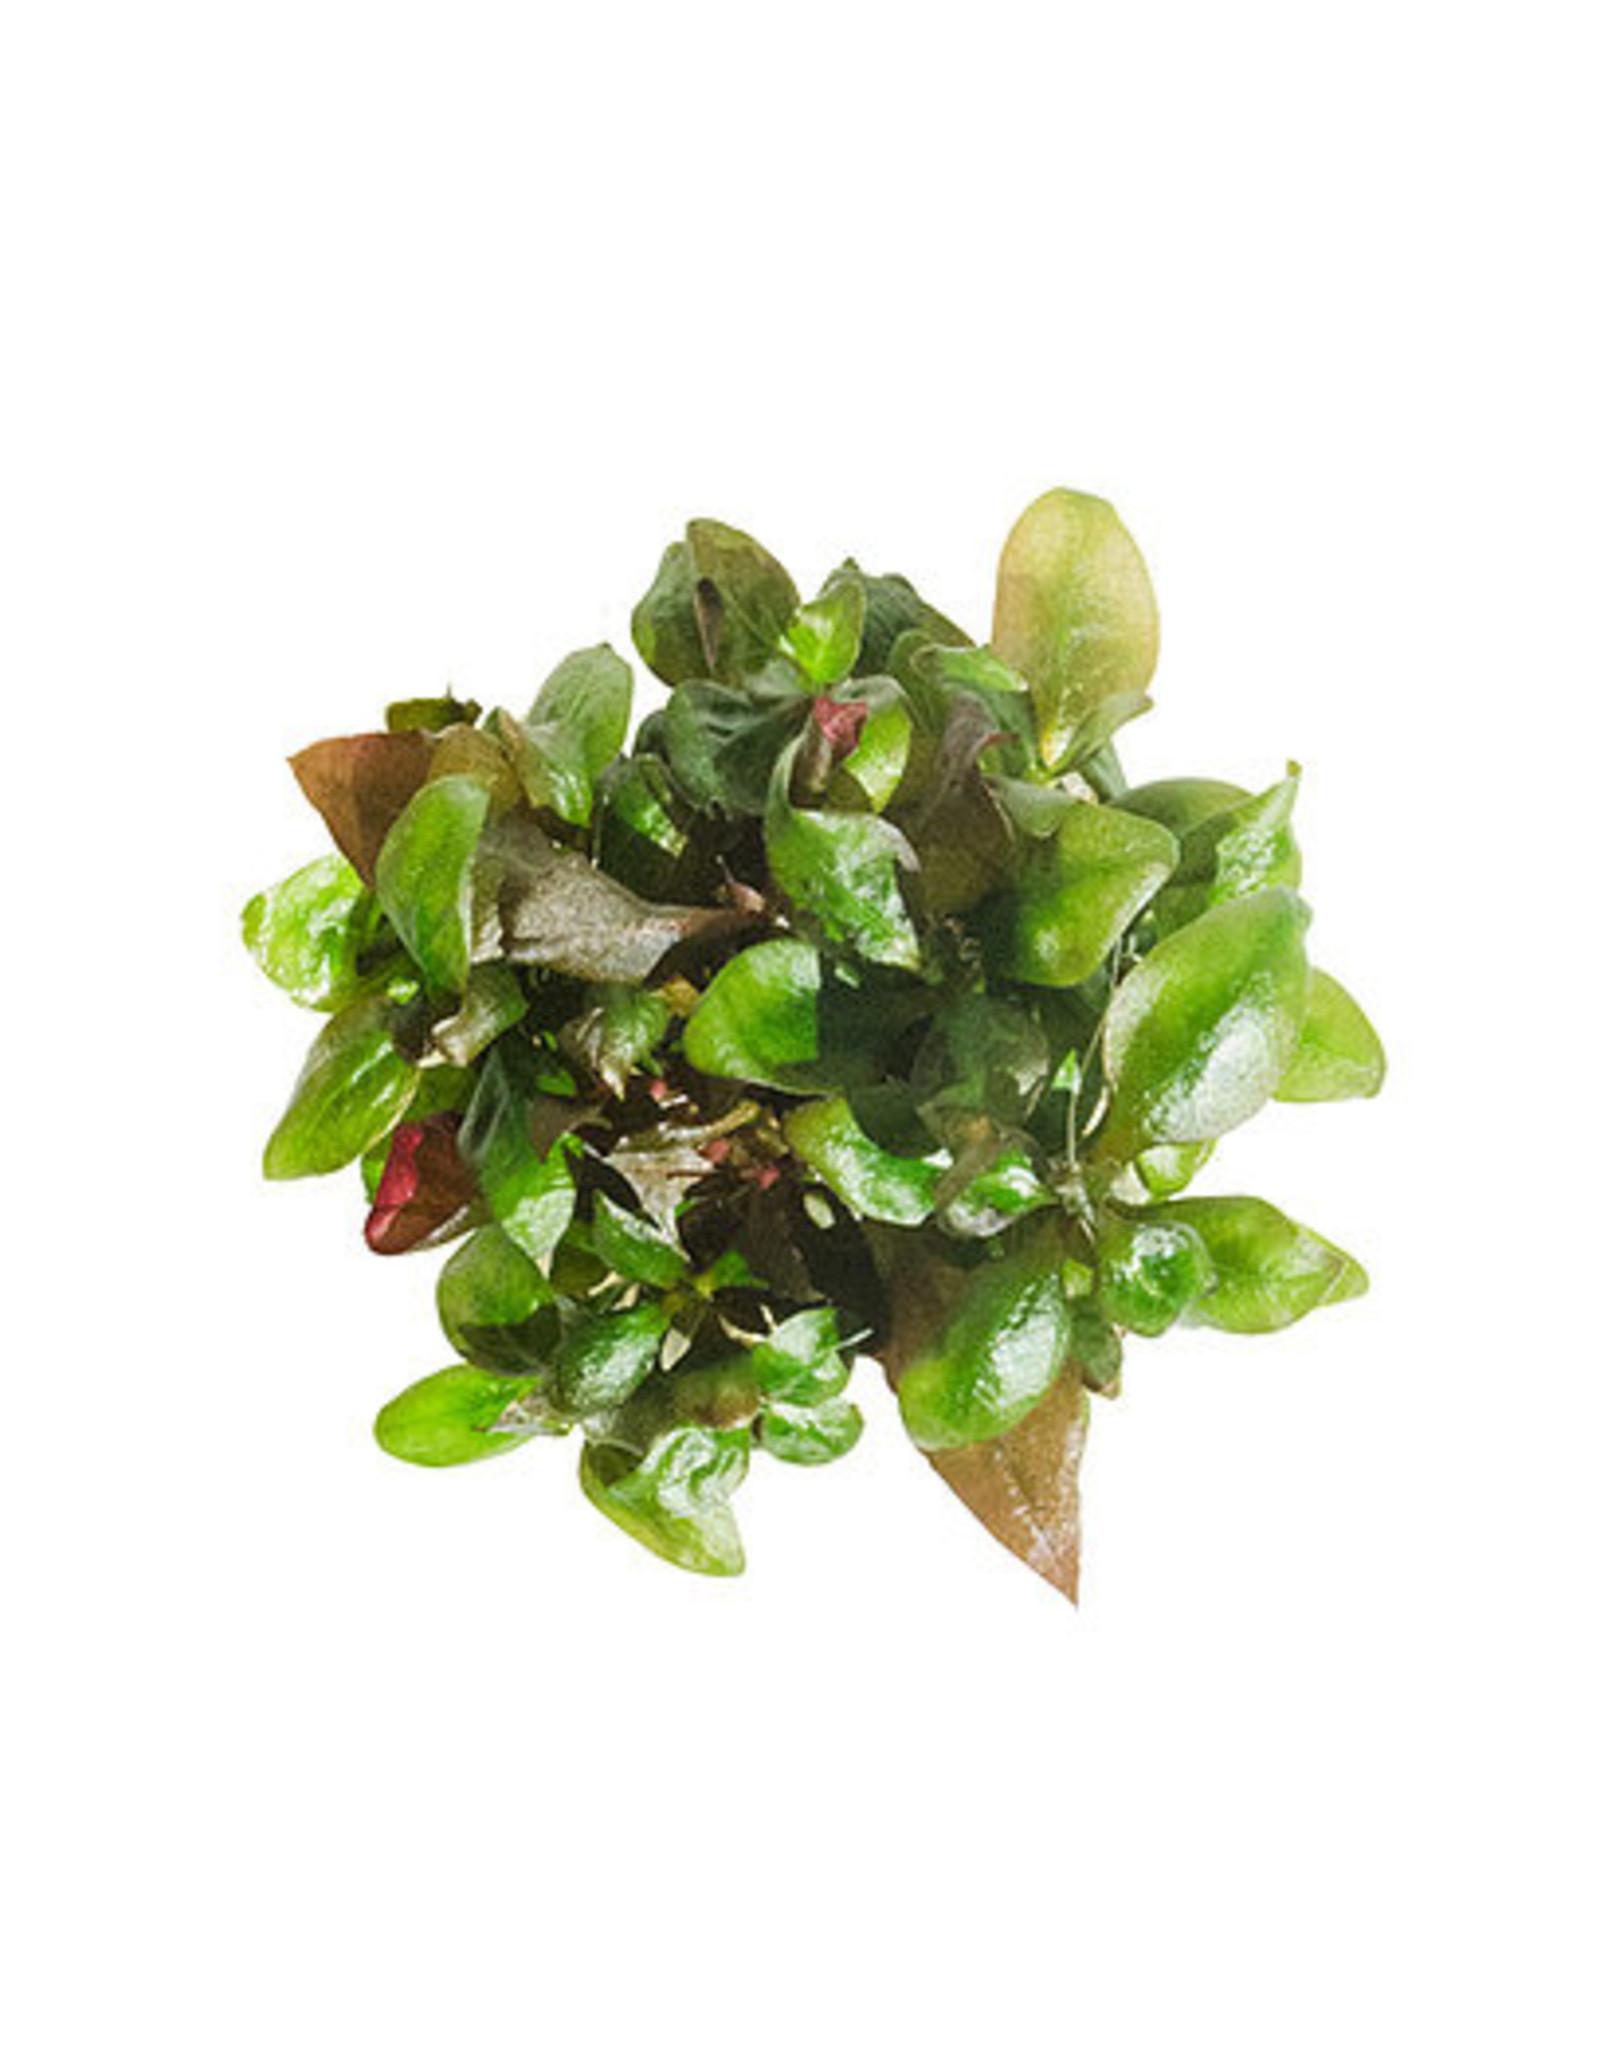 ABC Plants ABC PLANTS - Althernanthera reineckii var. Ocipus